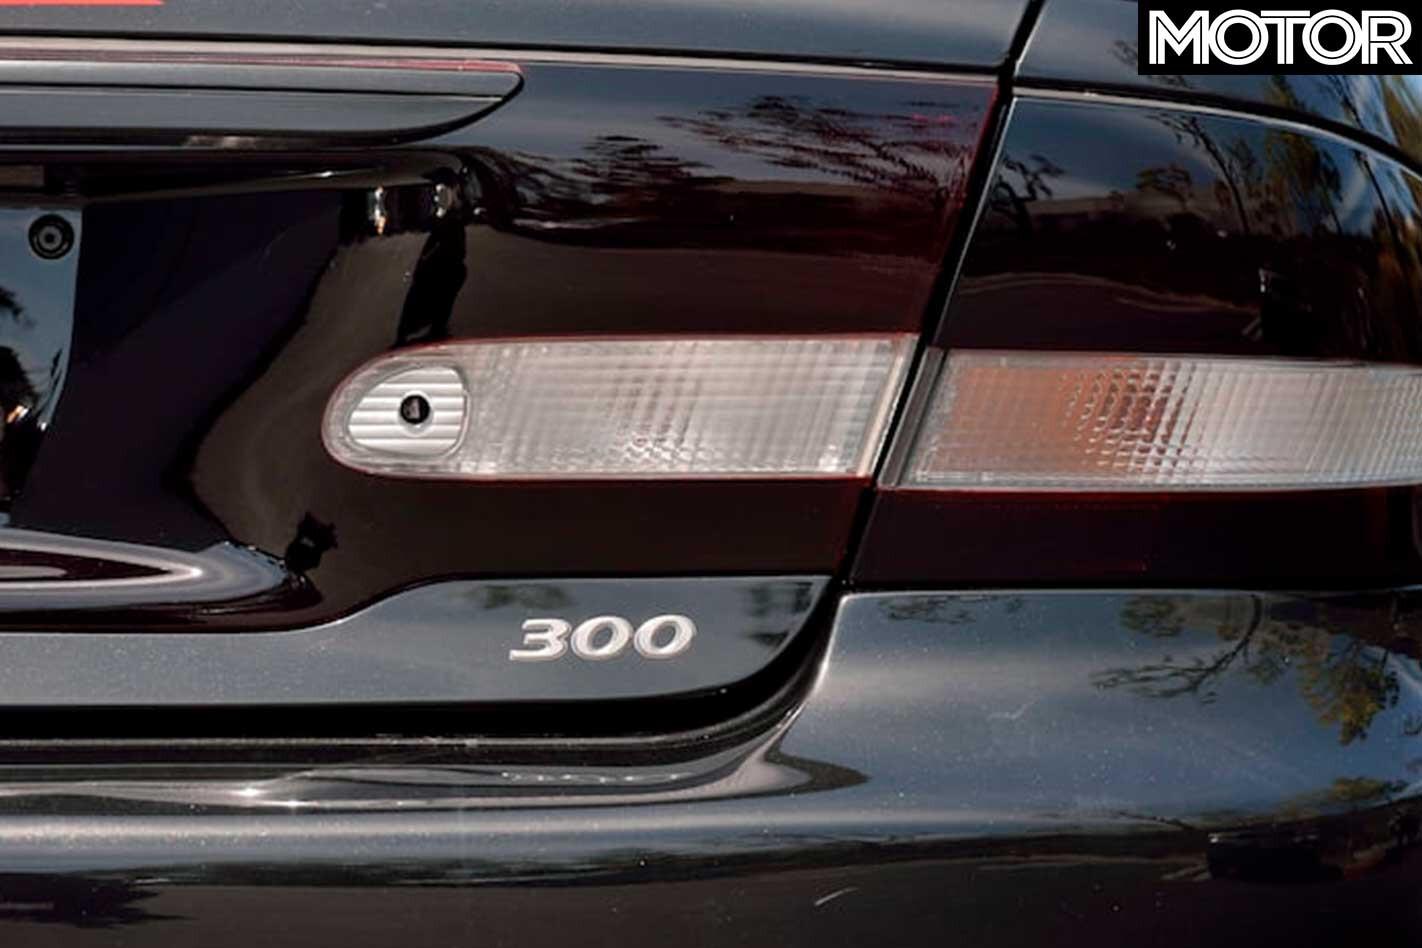 2000 HSV VTII GTS R Mecum Auction Rear Badge Jpg